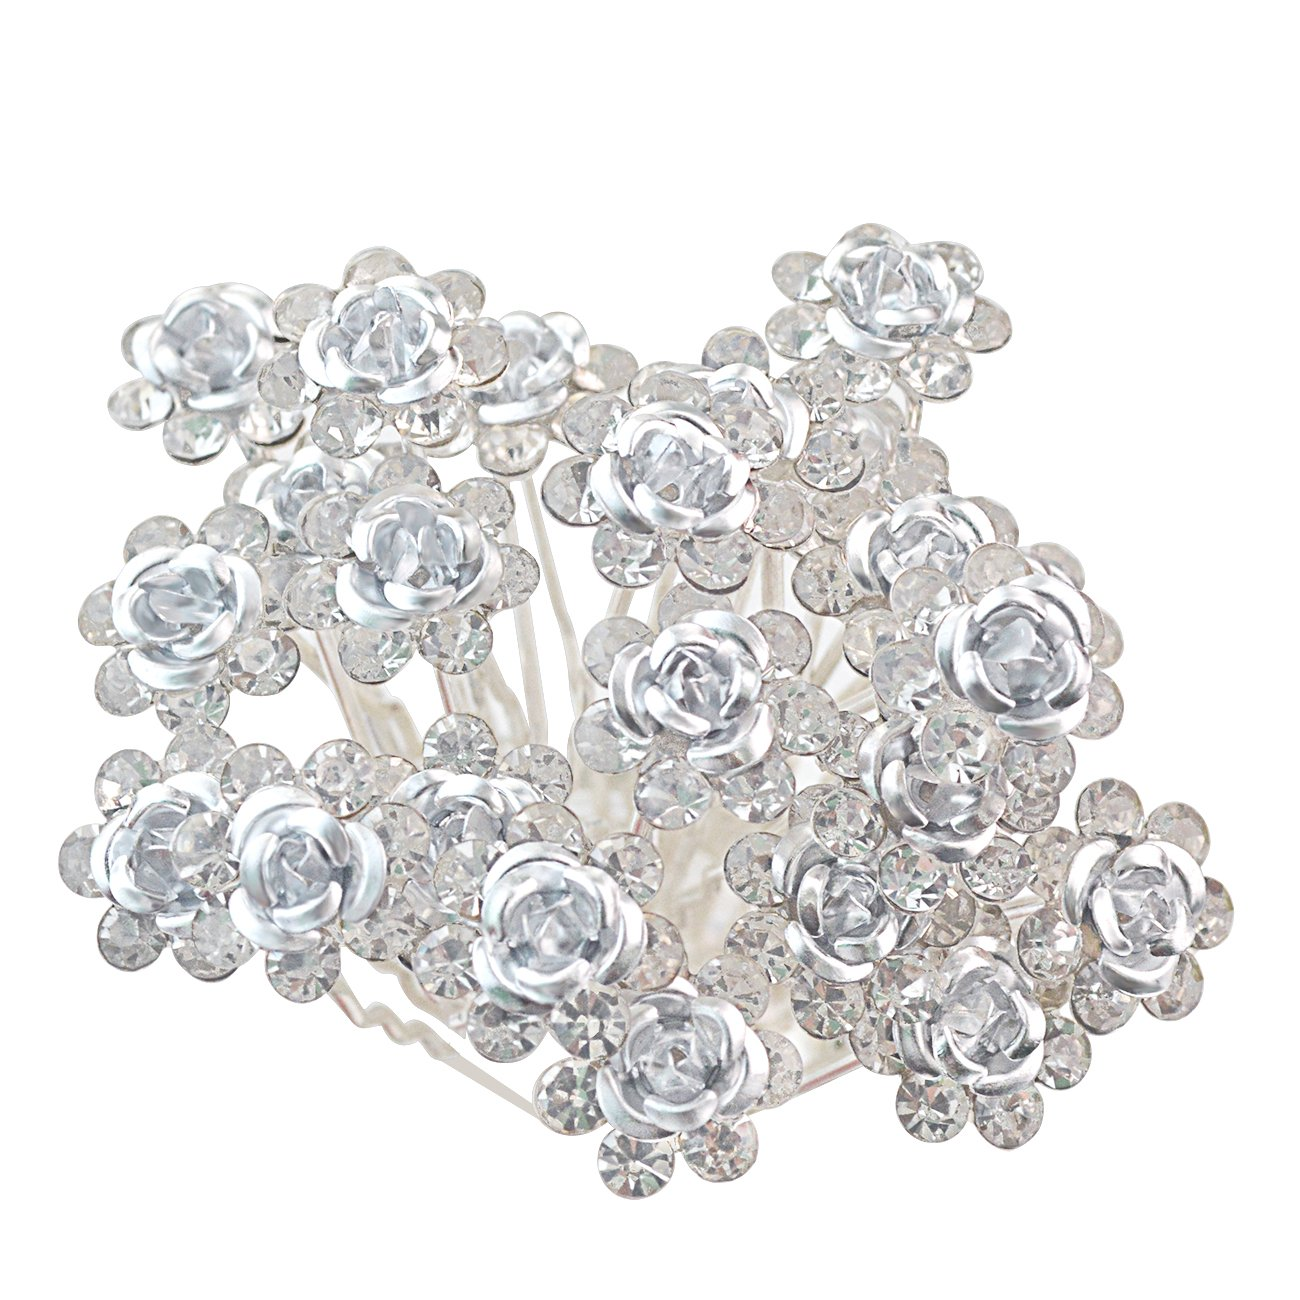 Rbenxia 20 Pcs Bridal Wedding Rhinstone Hair Pins 2.4 Inches Bridal Prom Clips Rose U-shaped Hair Pins for Women and Girls, White